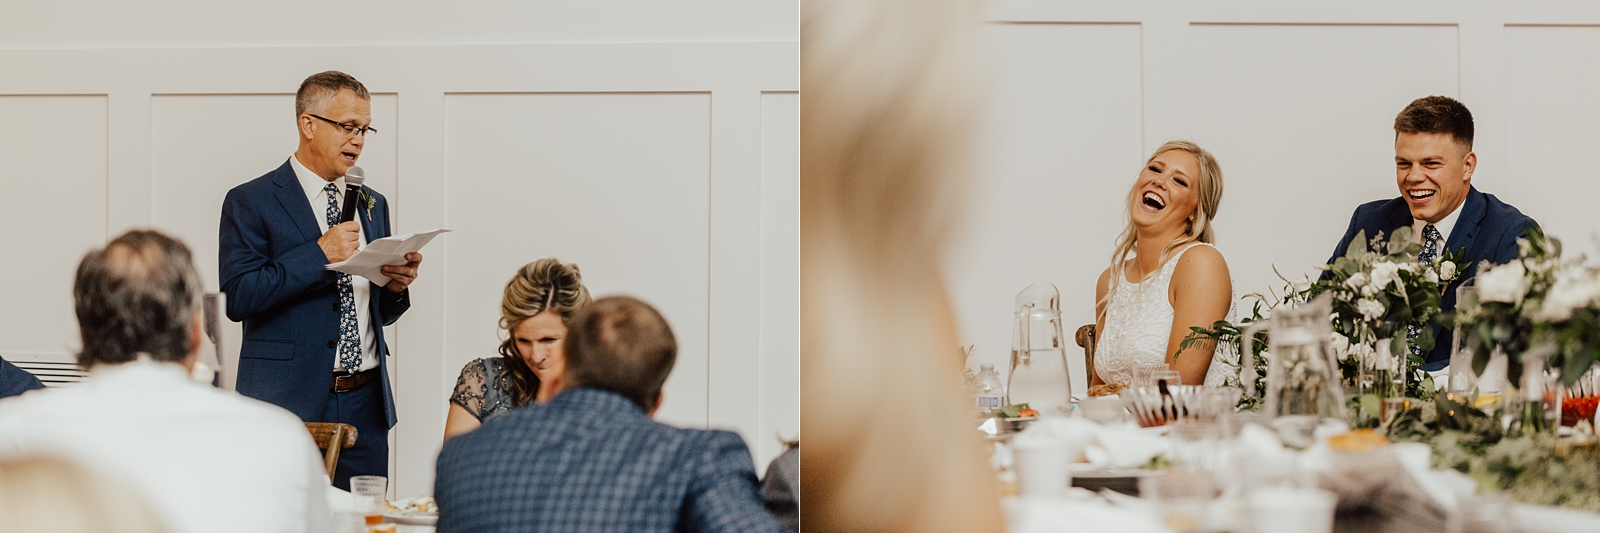 Anna & Trey Modern Minneapolis Wedding at The Hutton House_0737.jpg